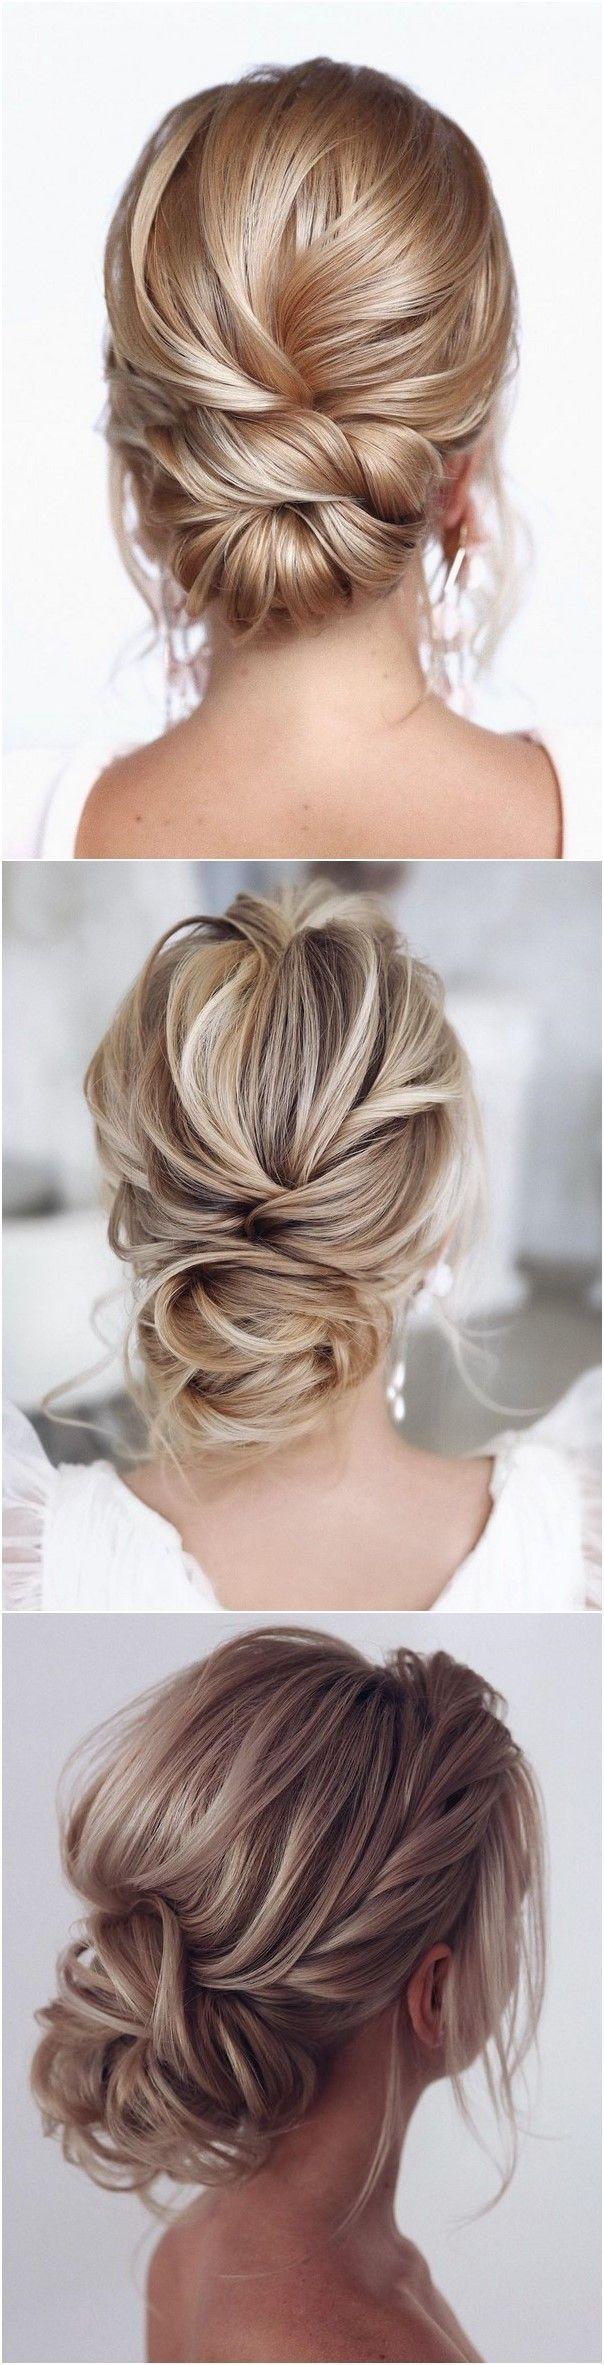 20 Classic Low Bun Wedding Hairstyles from Tonyastylist in ...